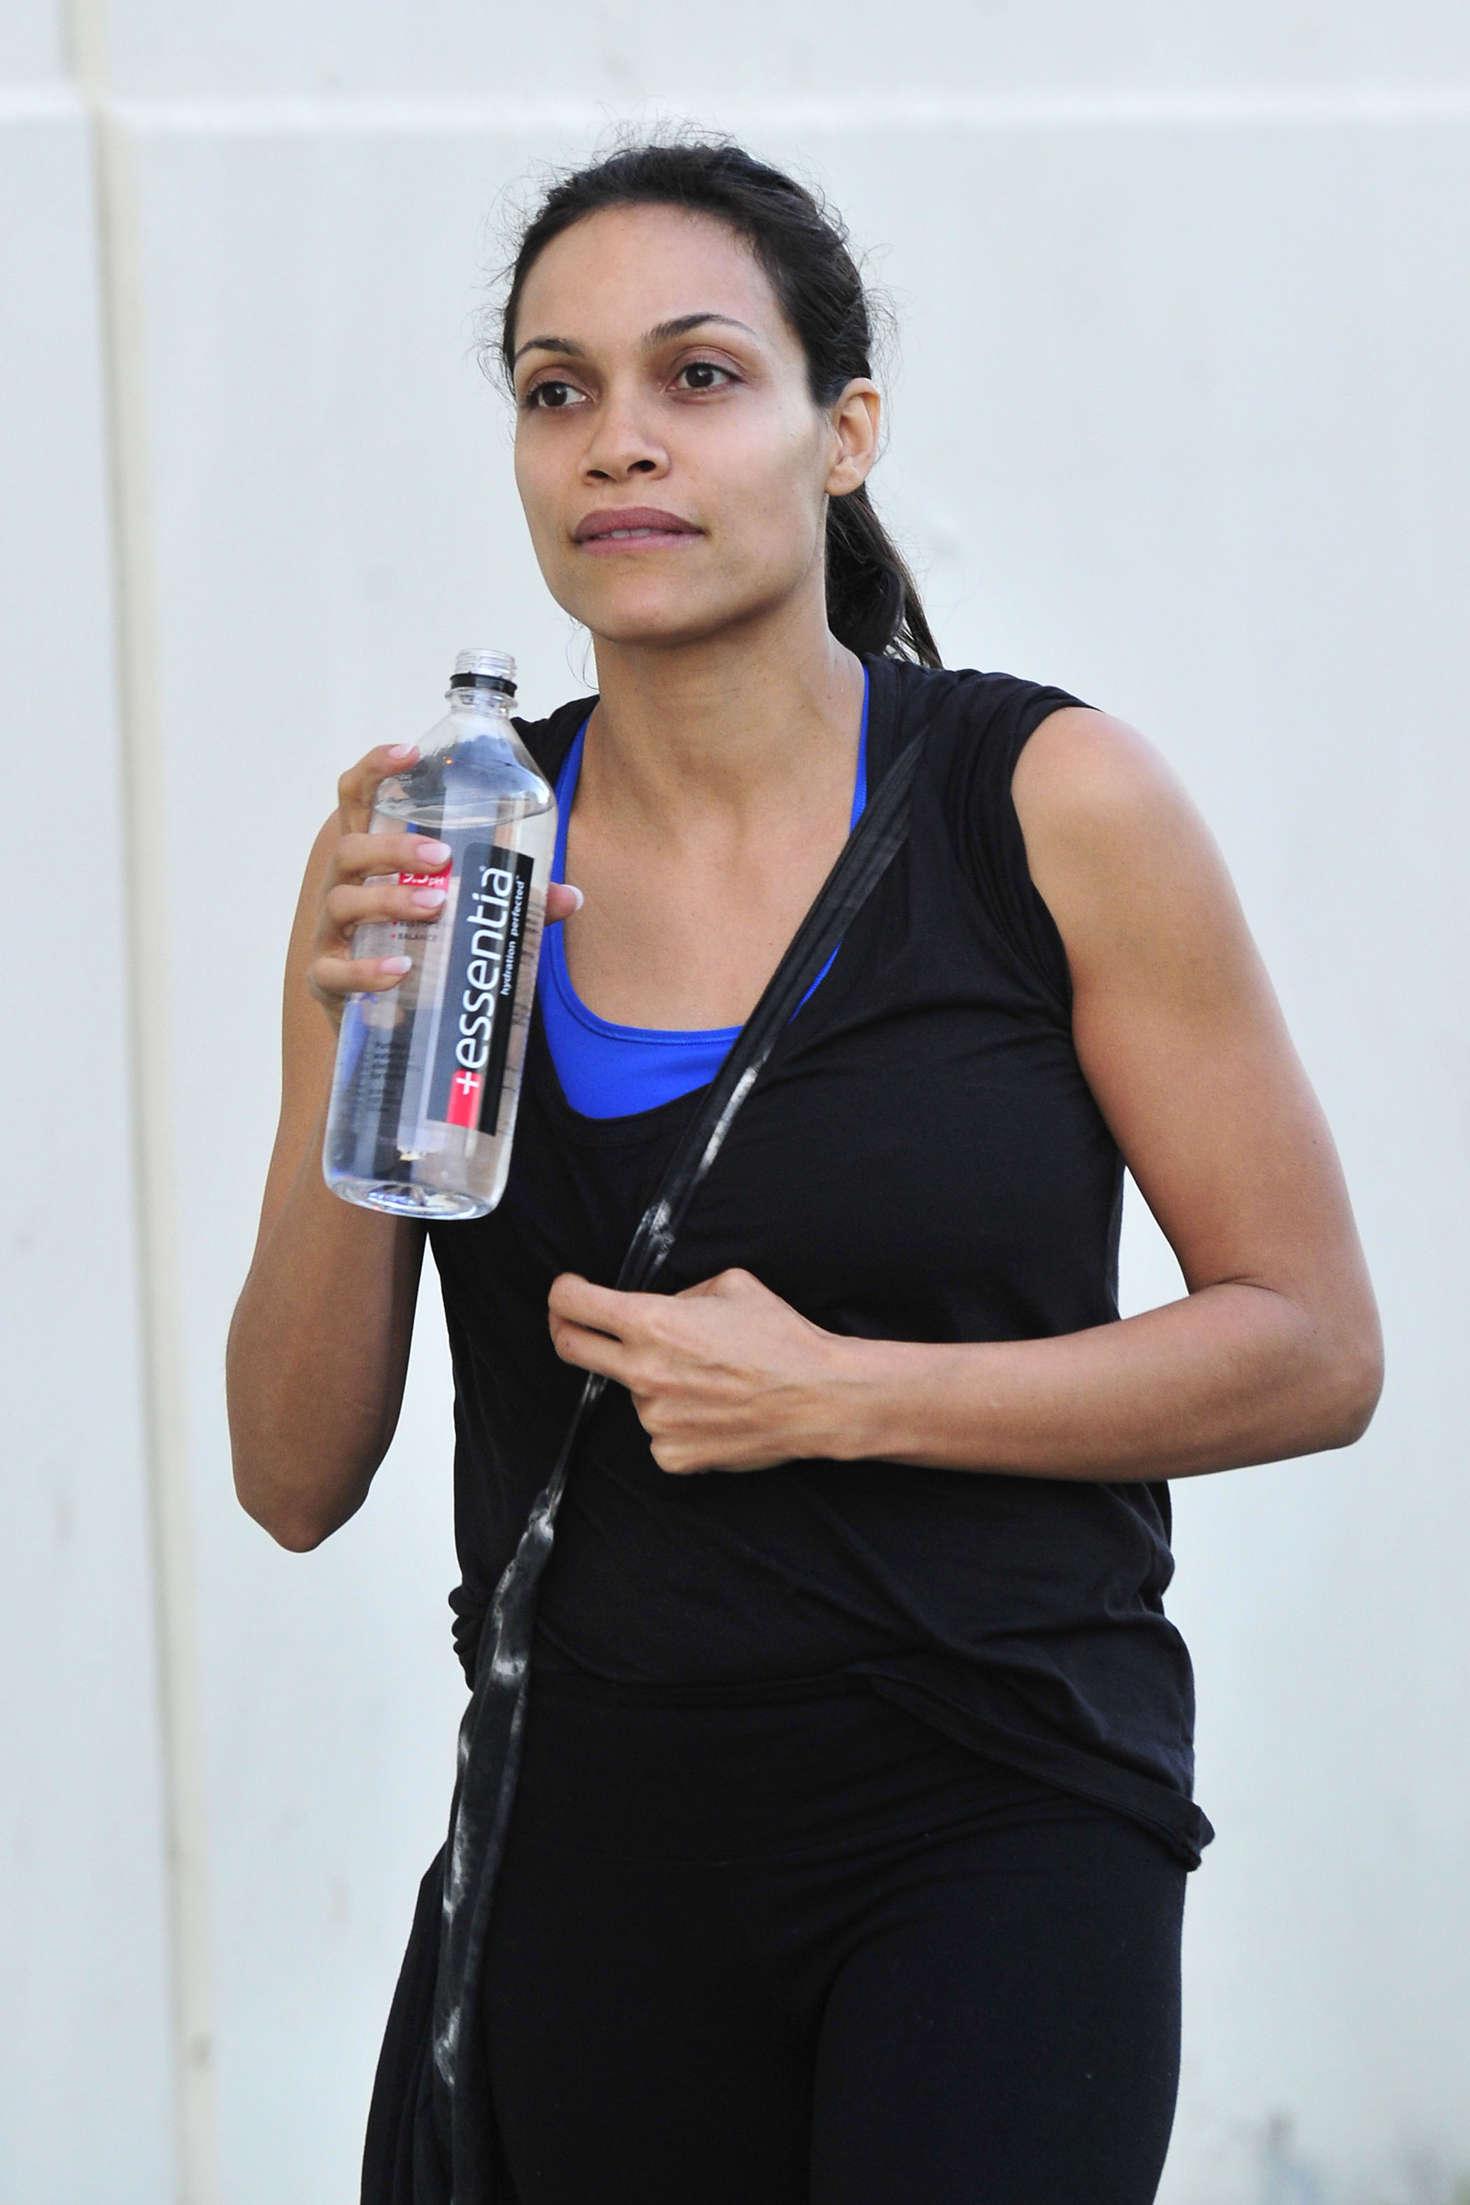 Rosario dawson leaving the gym 08 gotceleb for Gimnasio fitness rosario